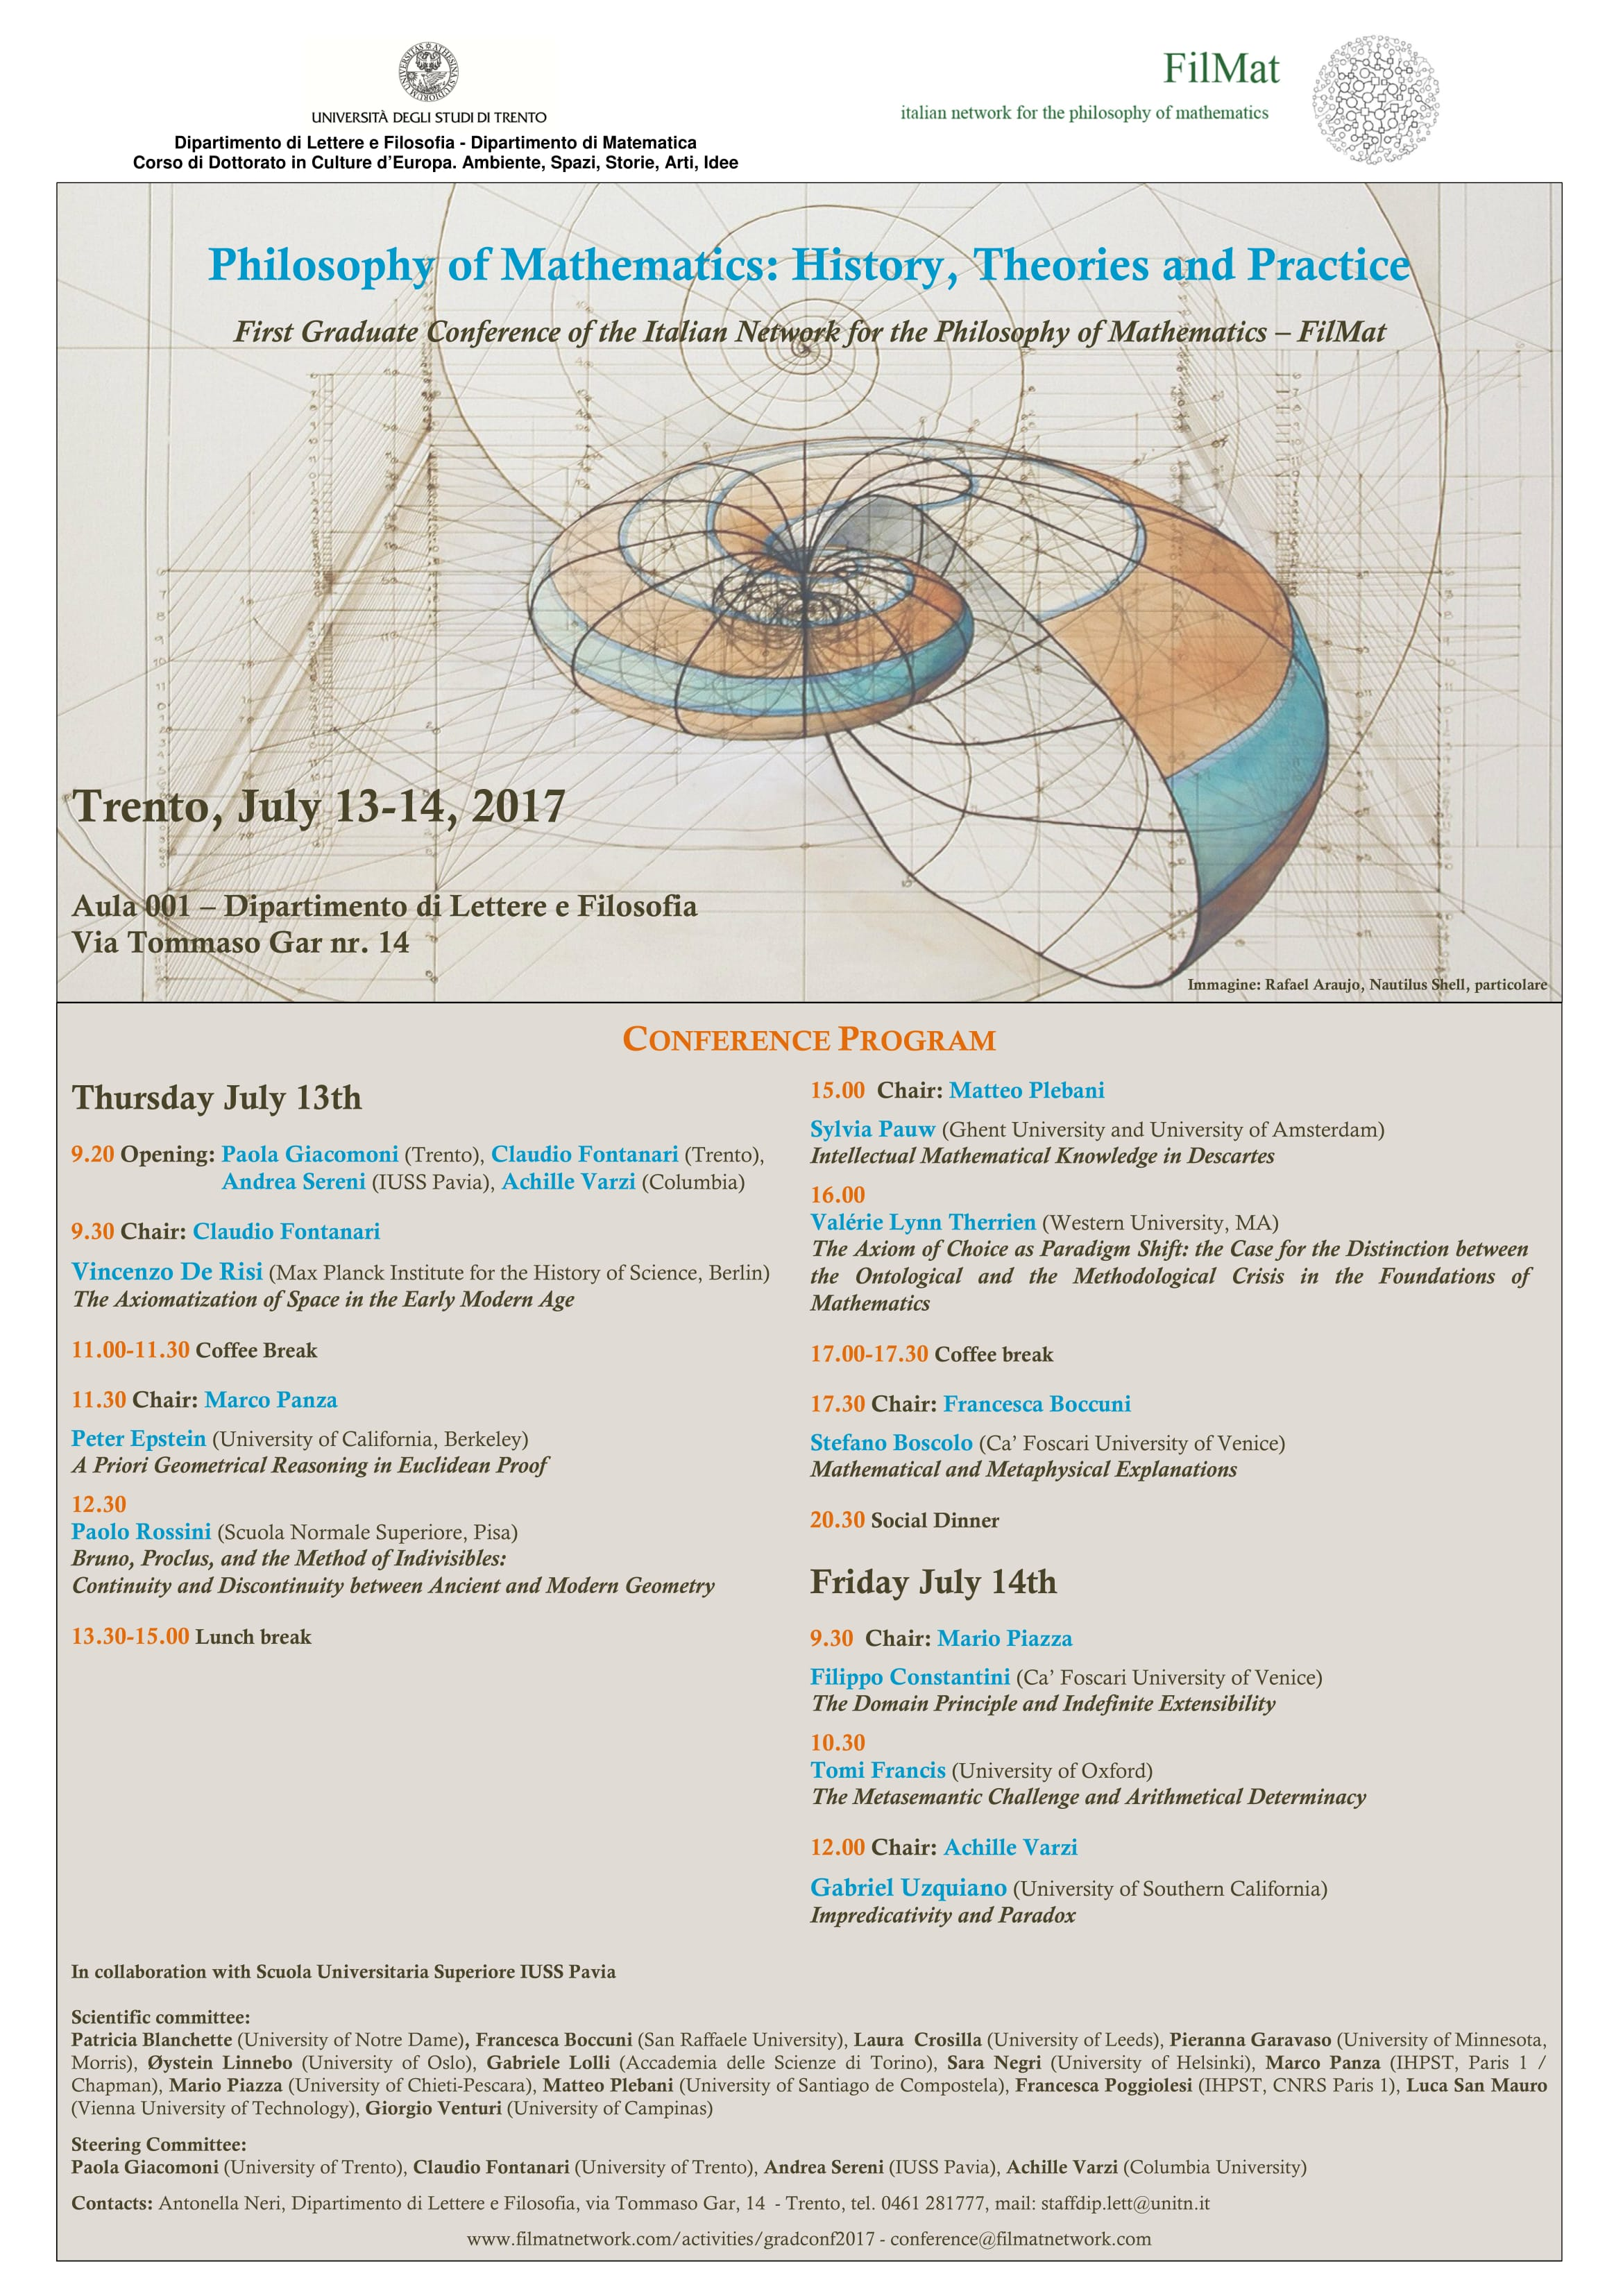 Filmat Italian Network For Philosophy Of Mathematics